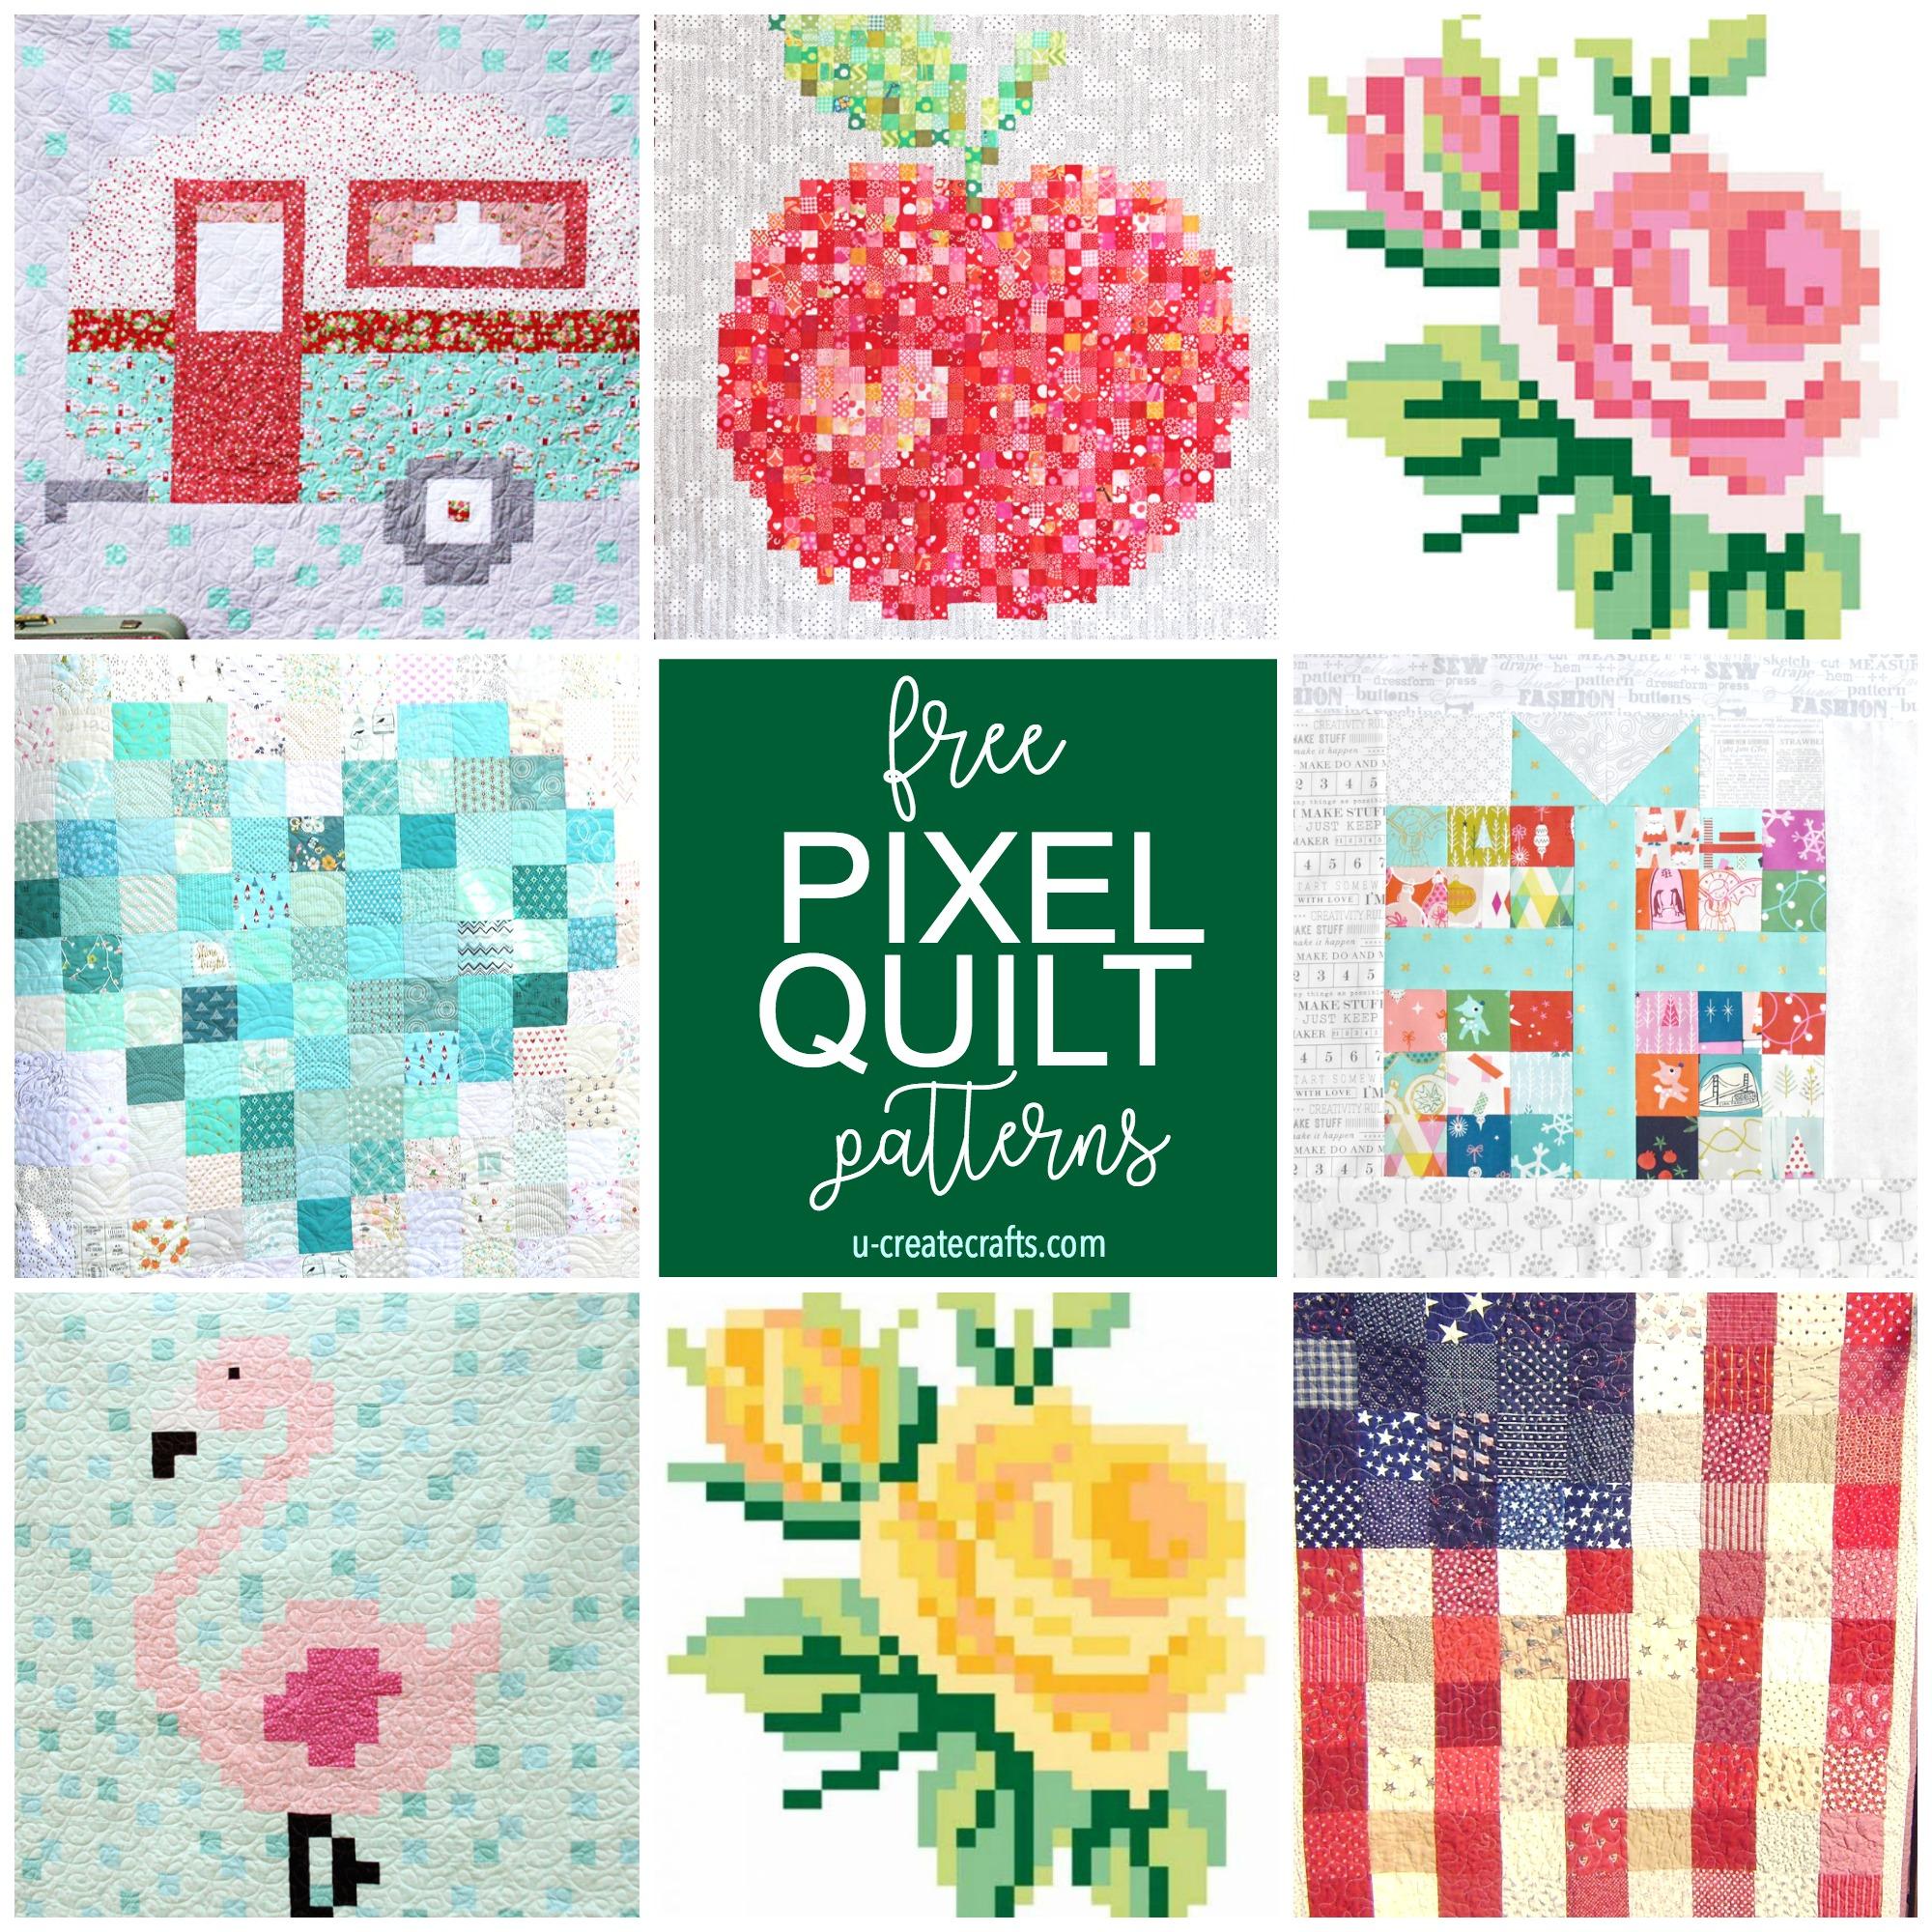 Free Pixel Quilt Patterns